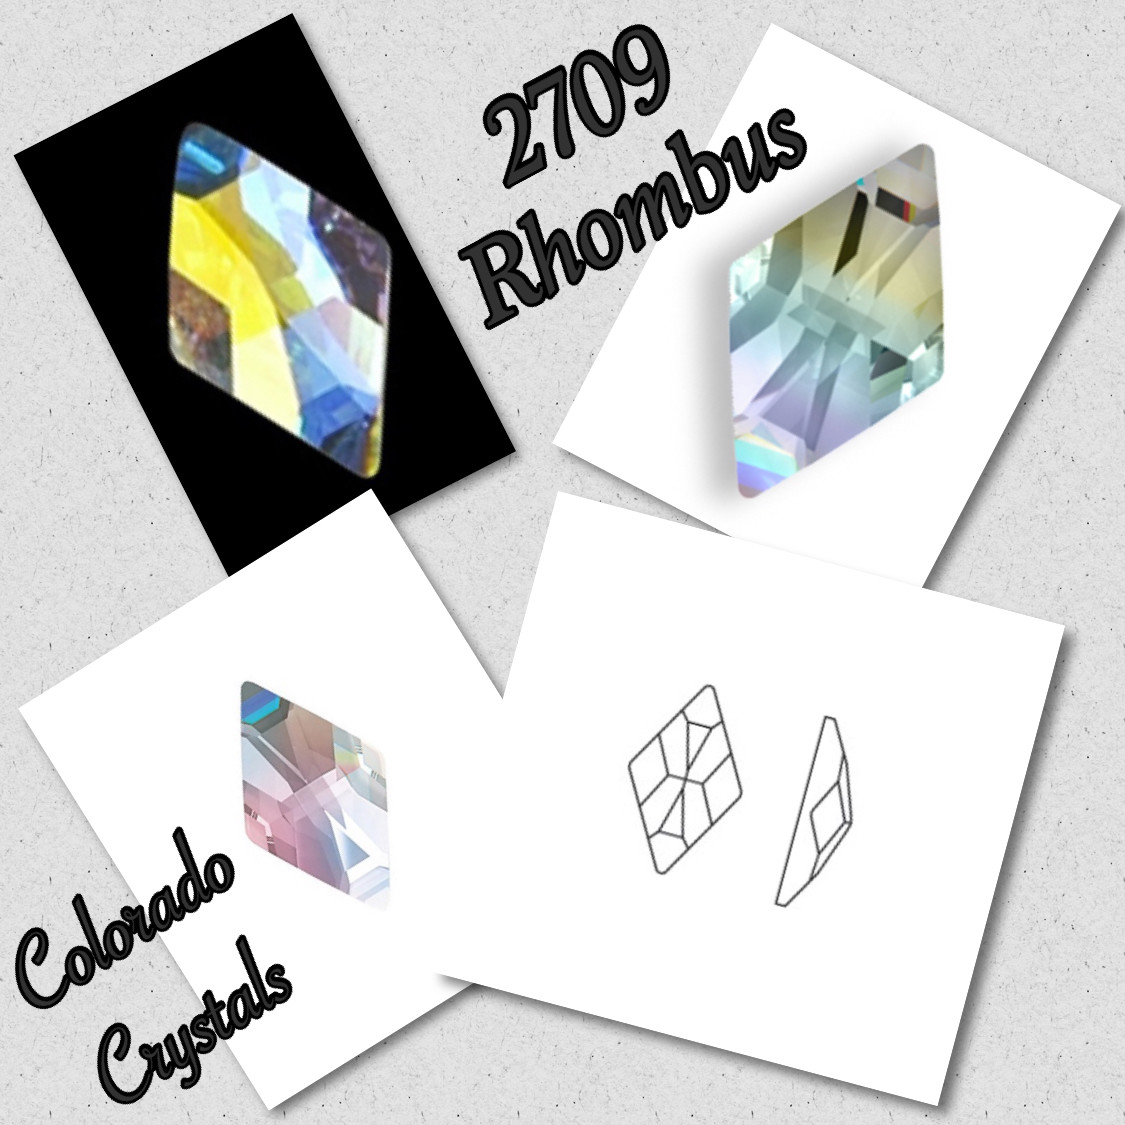 2709 Rhombus 13X8 - Crystal AB - Swarovski Fancy Flatback